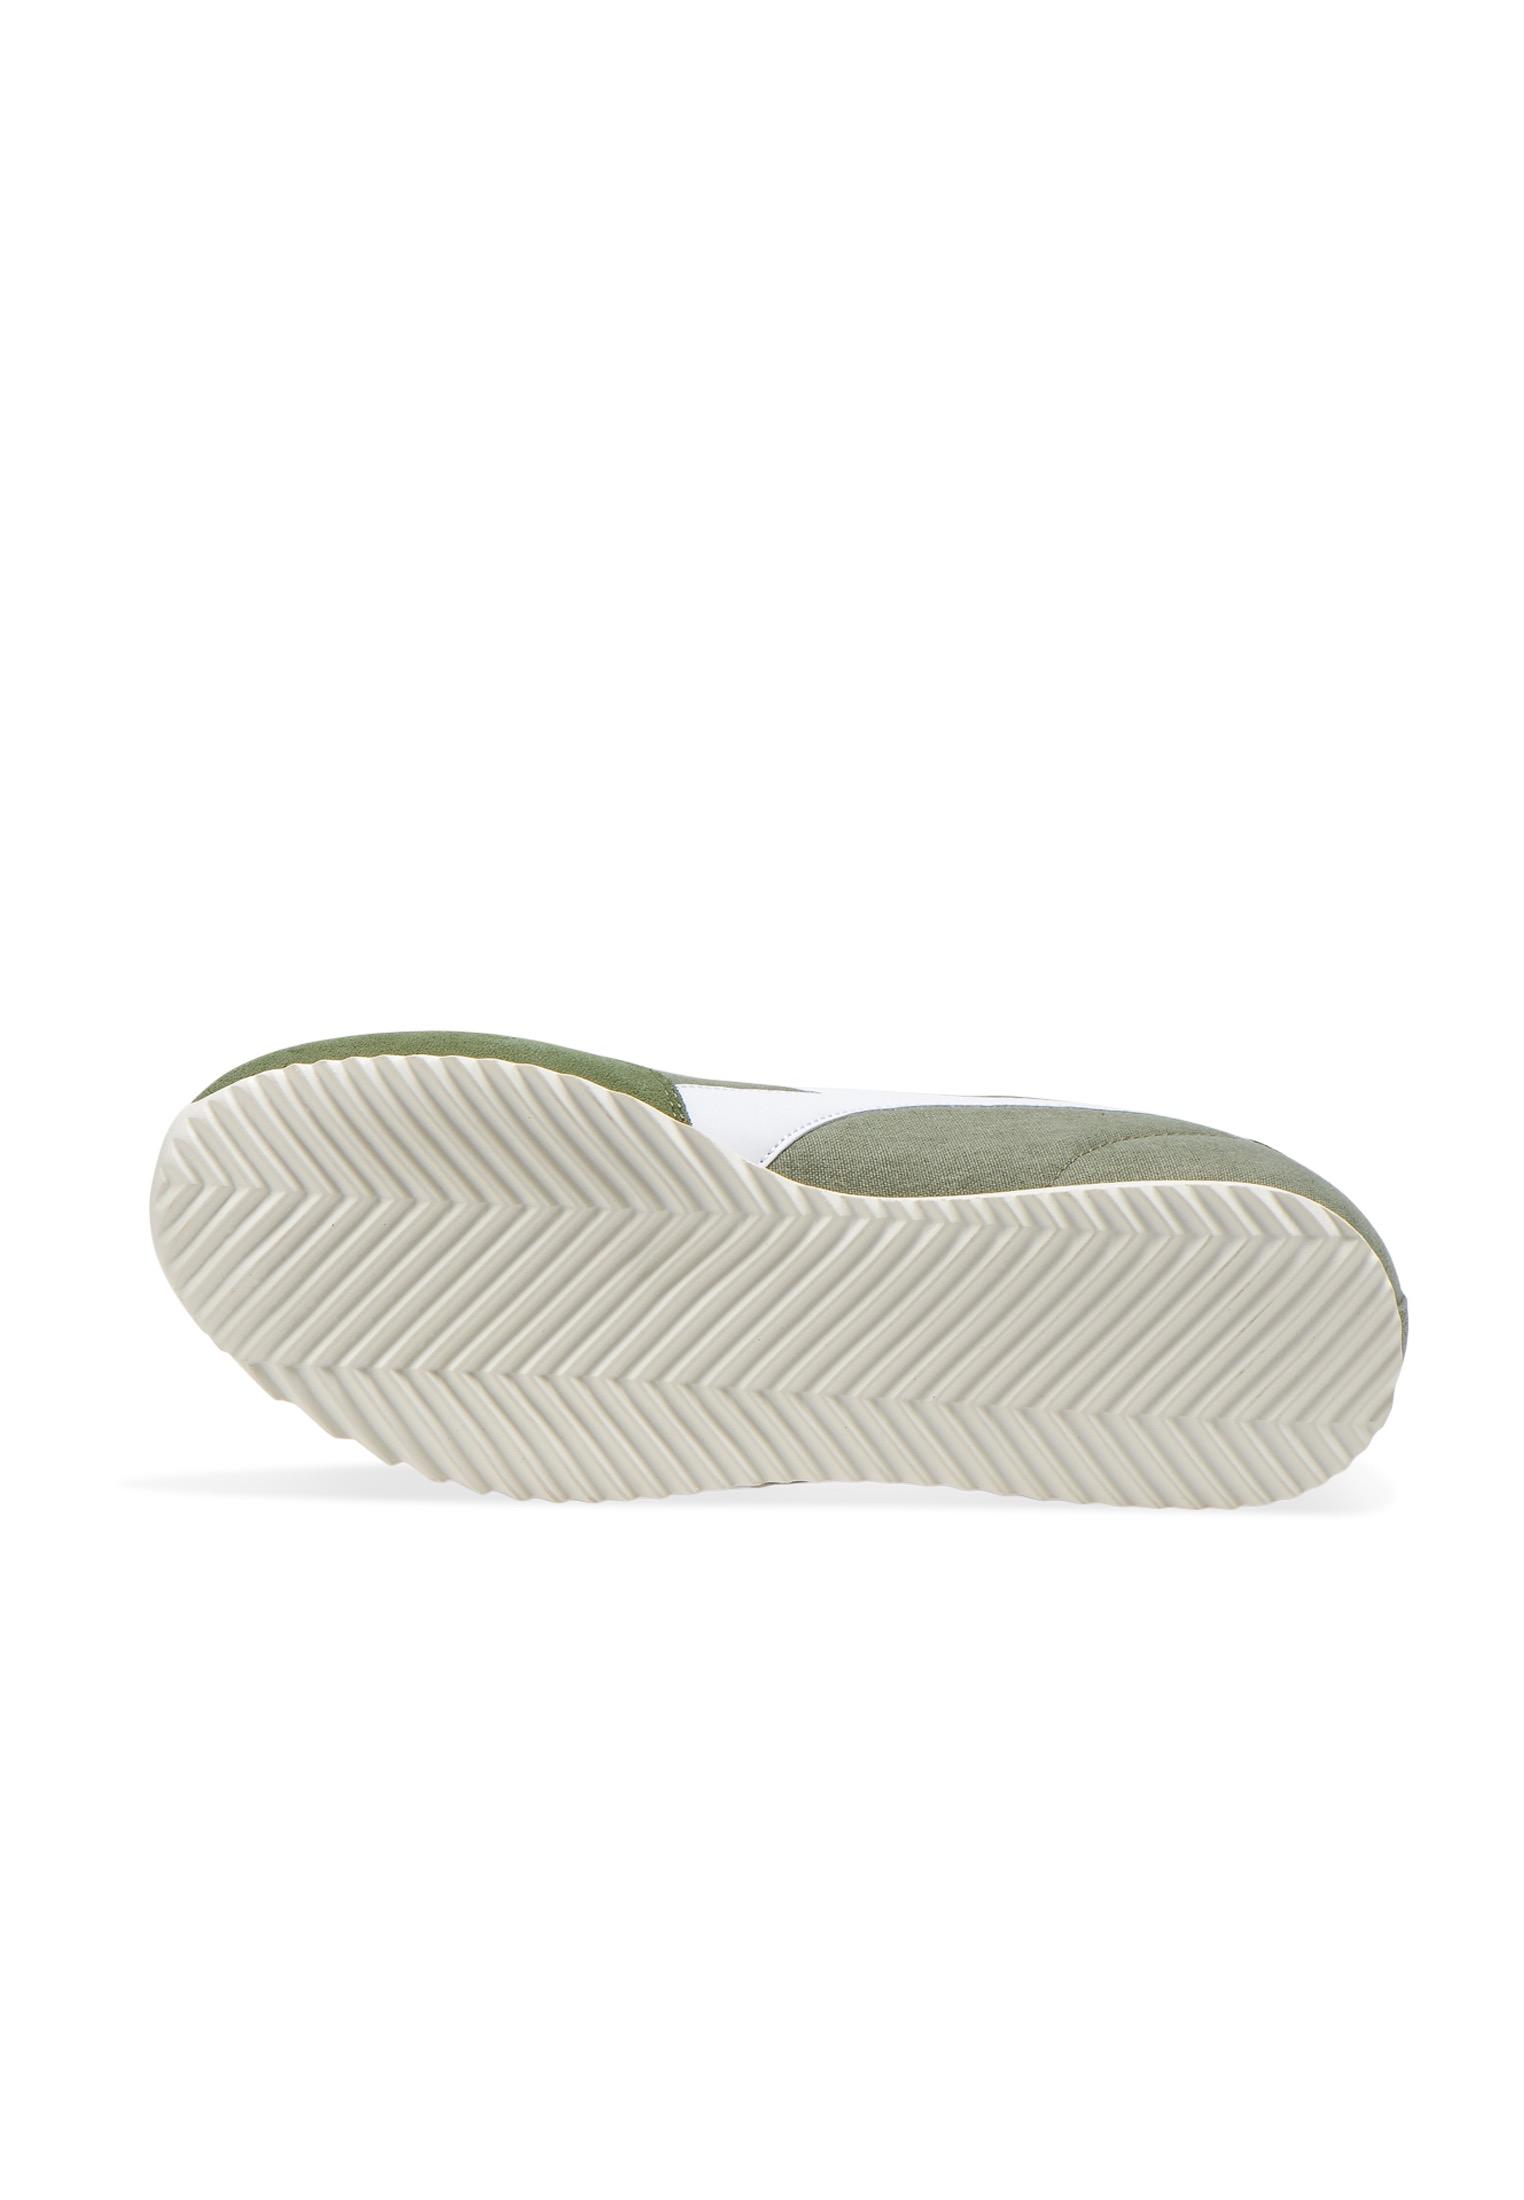 Scarpe-Diadora-Jog-Light-C-Sneakers-sportive-uomo-donna-vari-colori-e-taglie miniatura 64